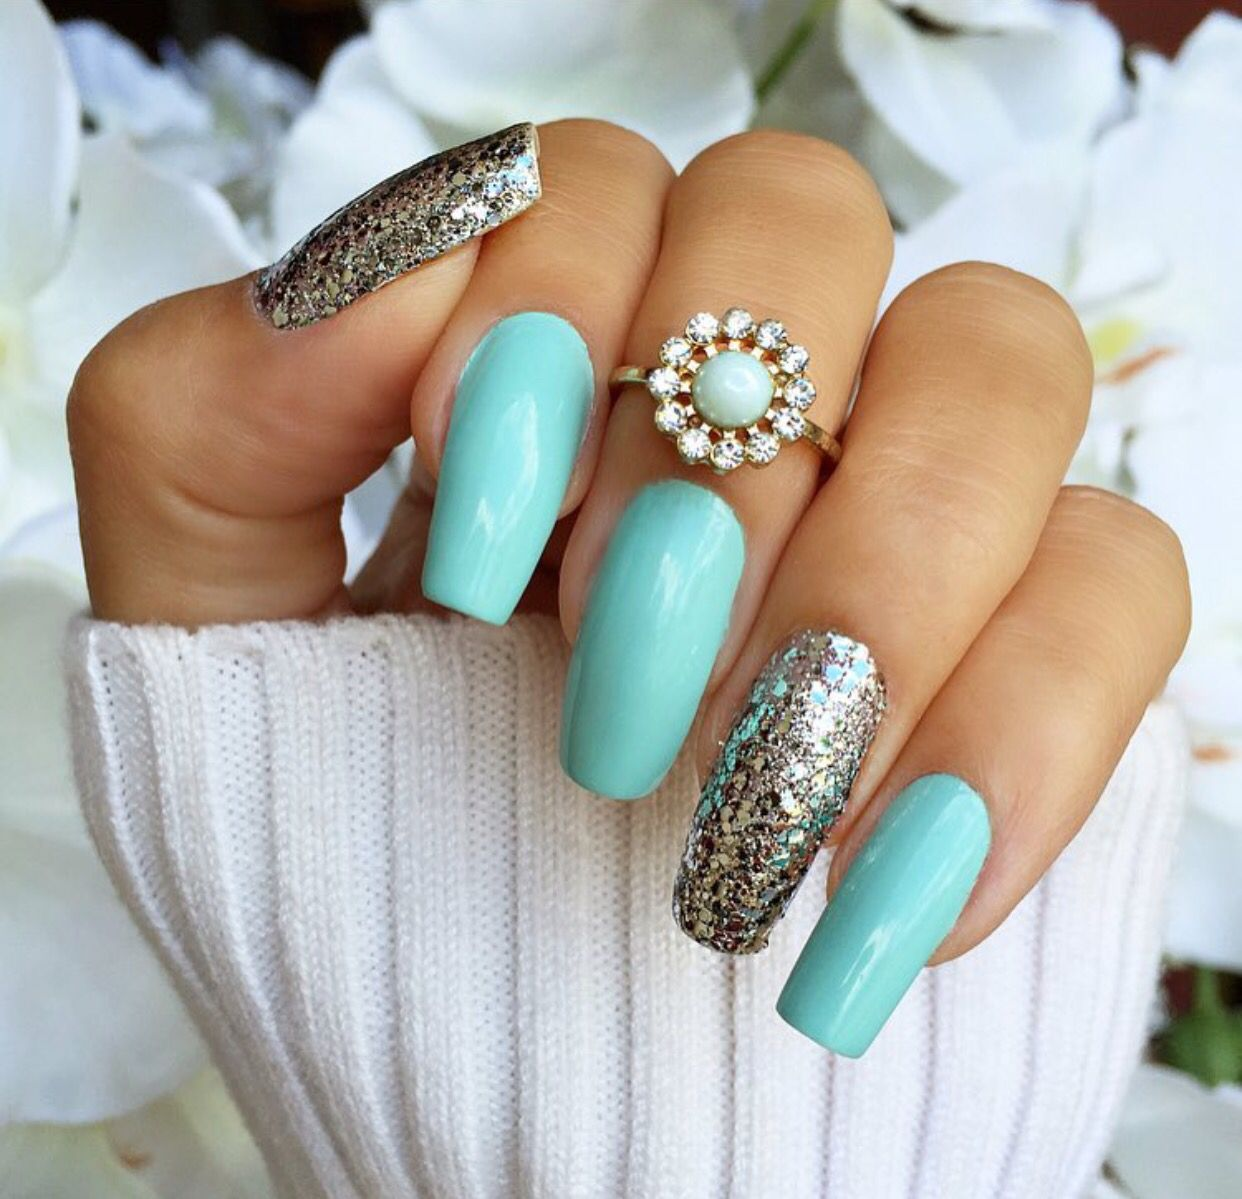 Turquoise glitter coffin nails | Beautiful nails! | Pinterest